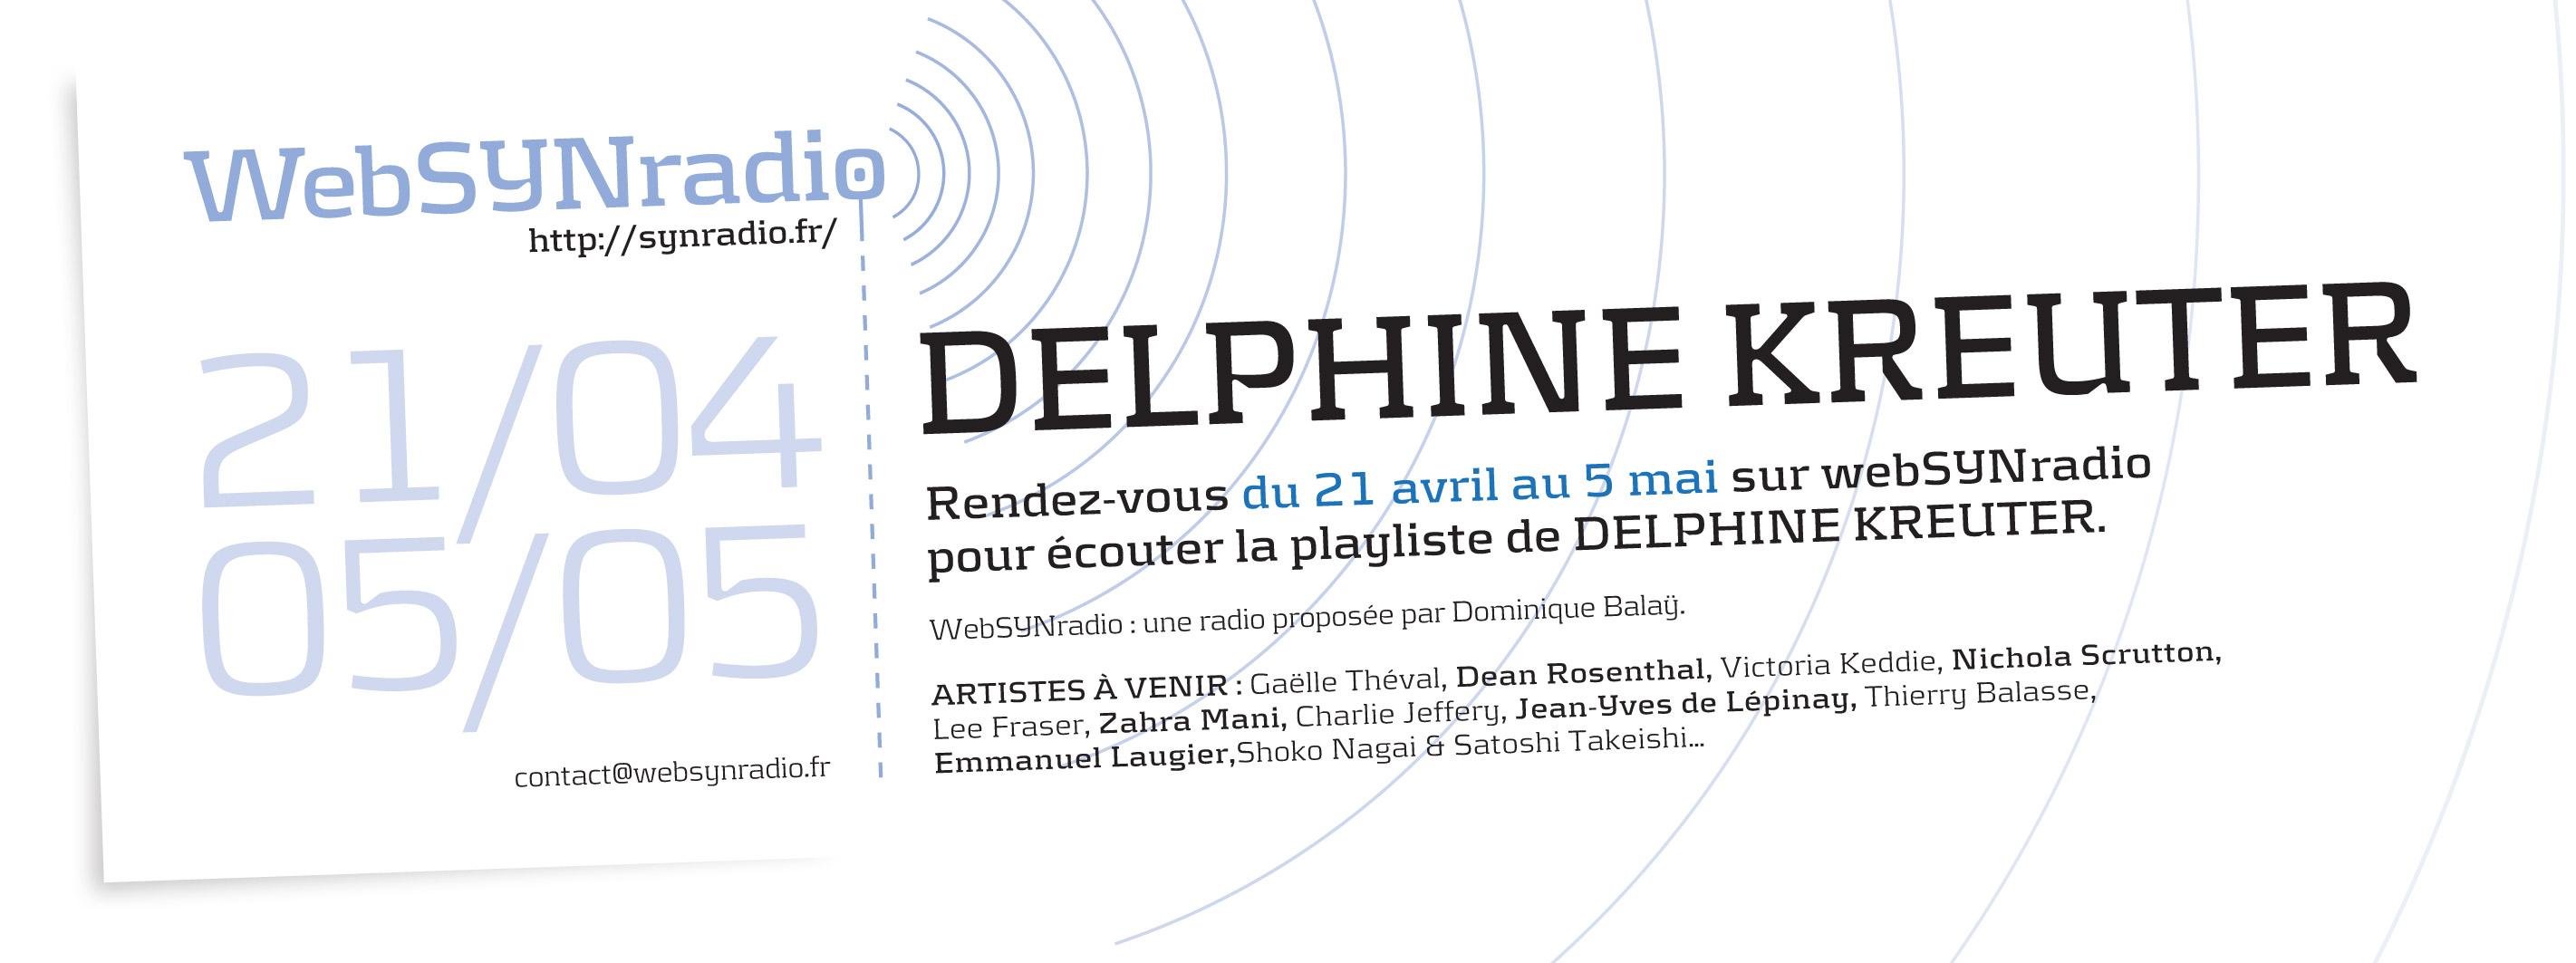 Delphine-Kreuter websynradio